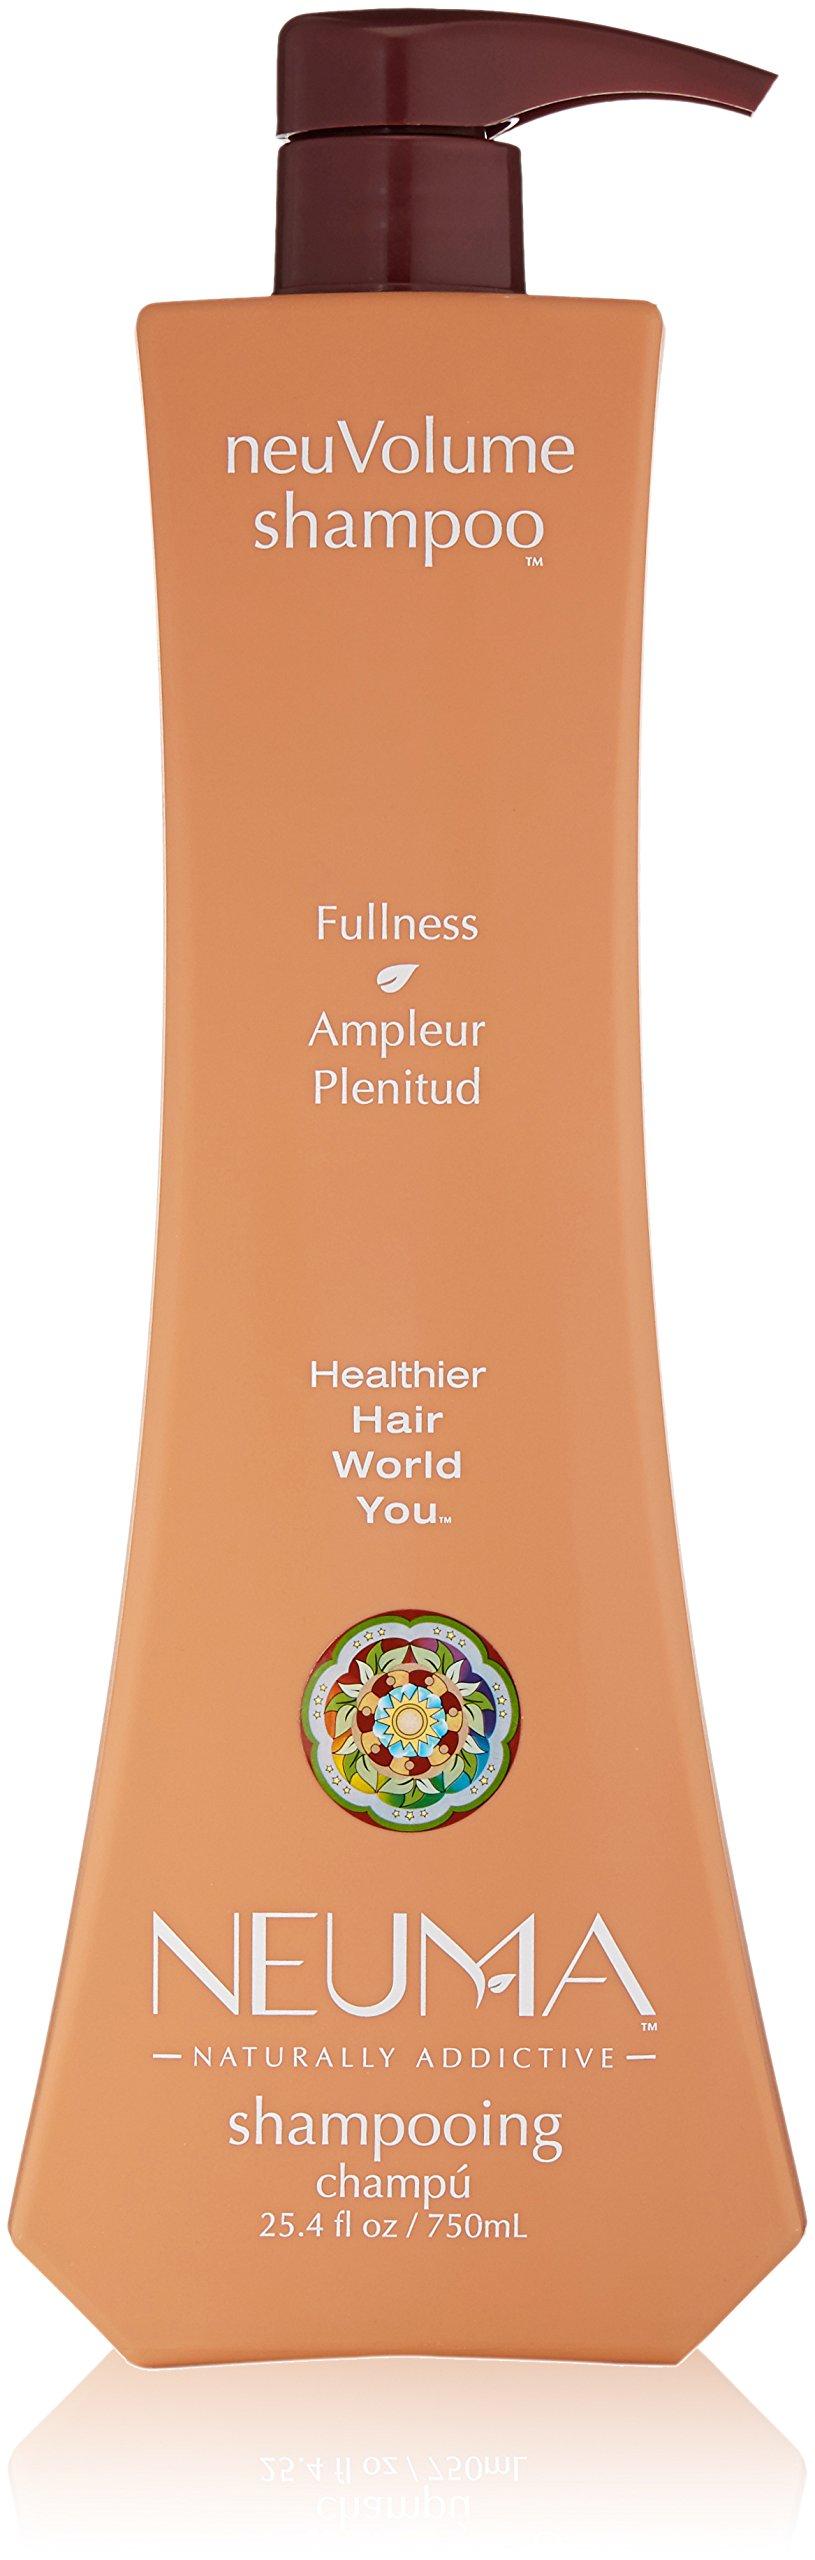 NEUMA neuVolume Fullness Shampoo, 25.4 oz.